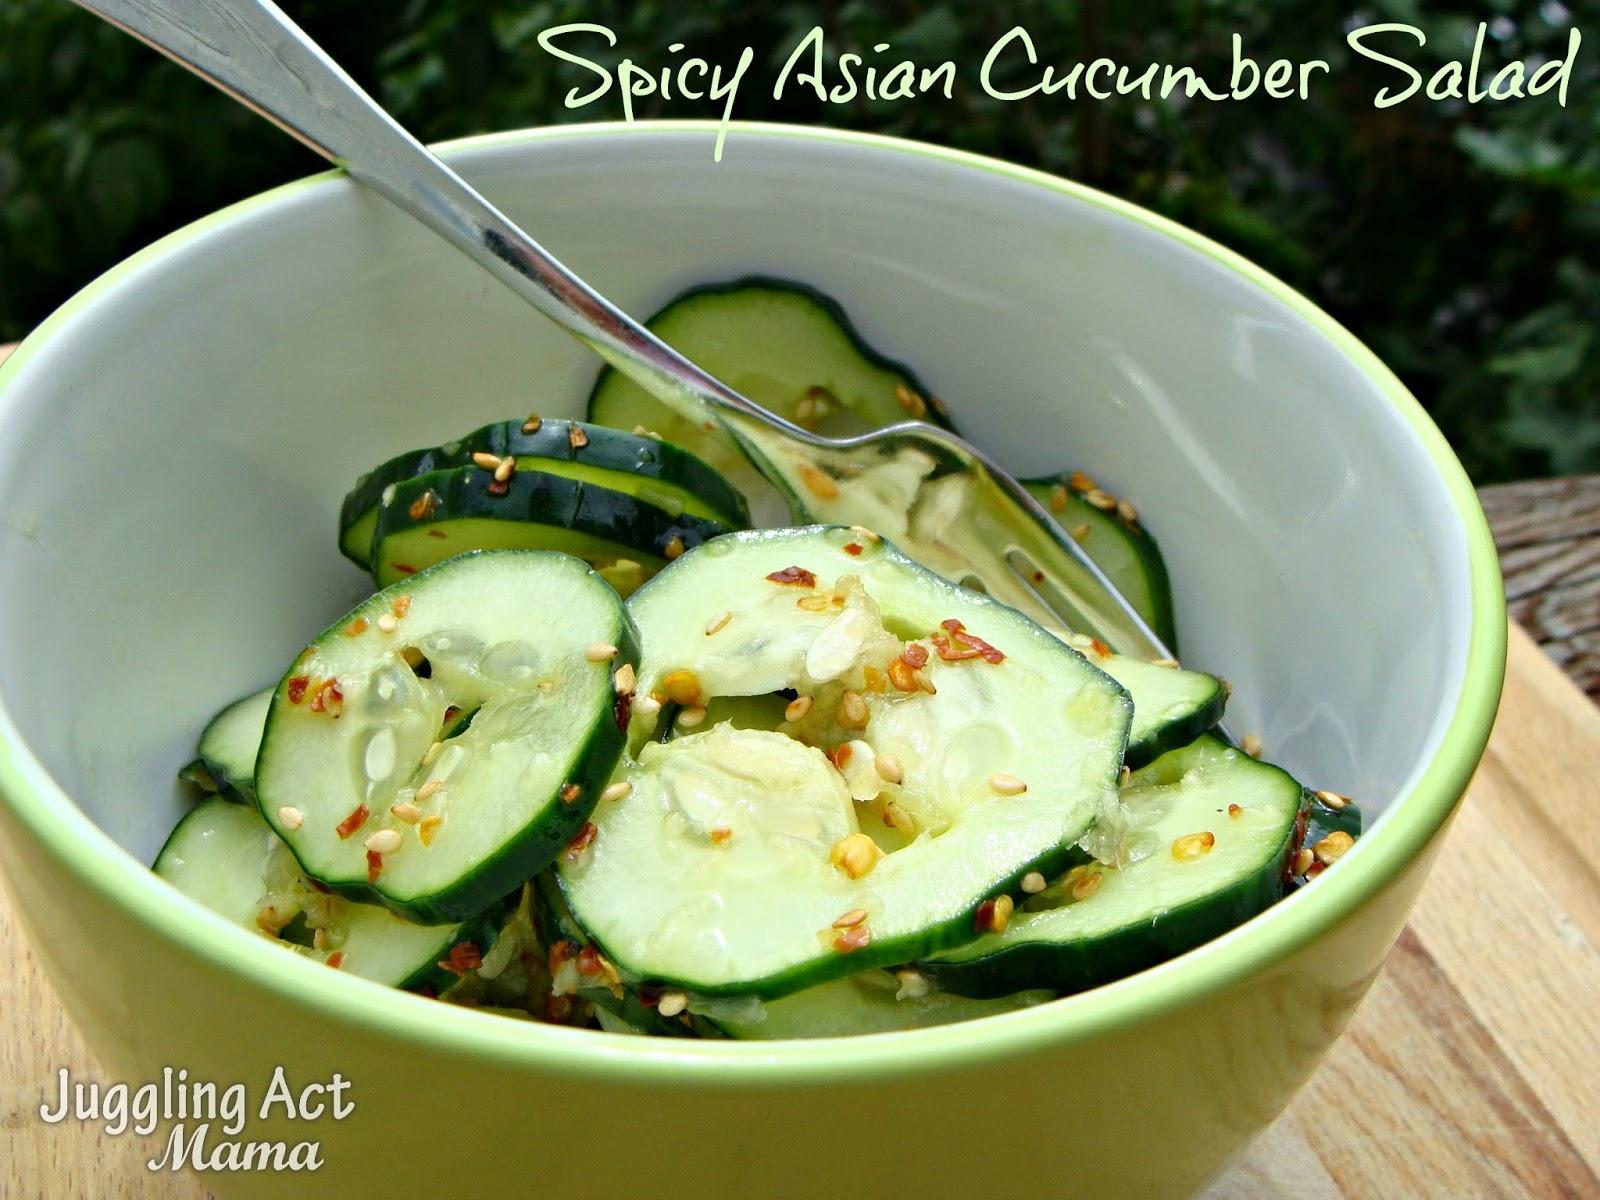 Spicy Asian Cucumber Salad via Juggling Act Mama